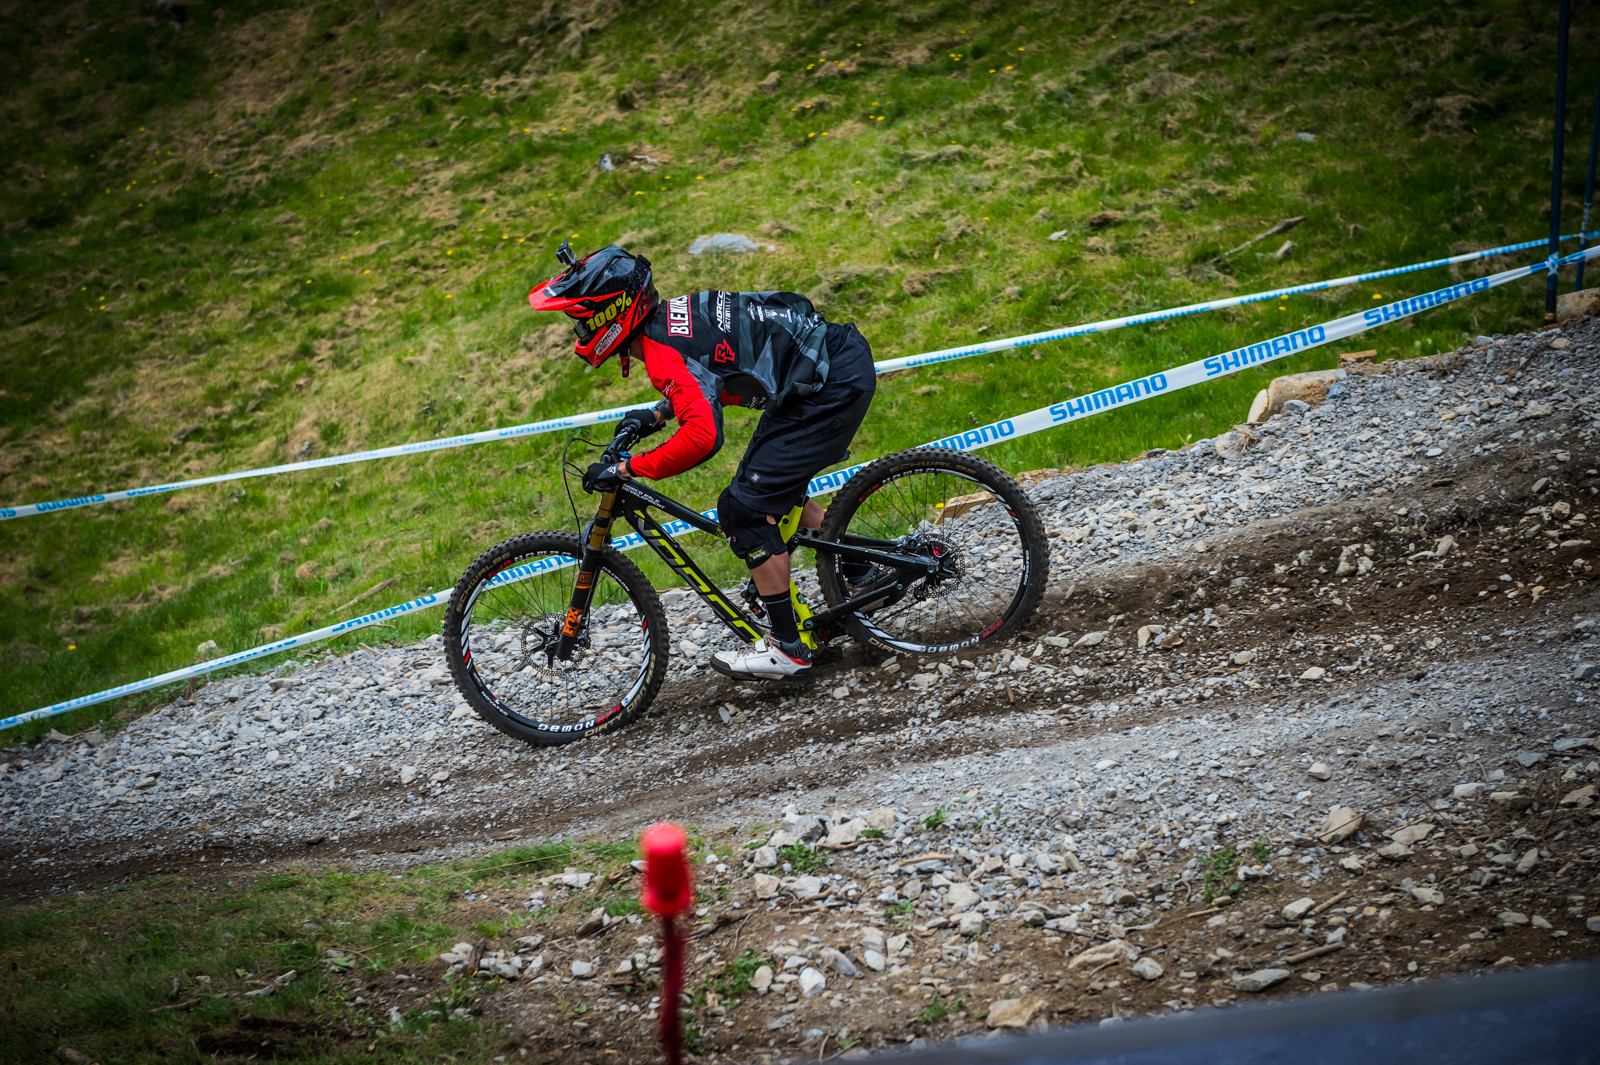 Sam Blenkinsop G-Out Project - Lourdes World Cup - G-Out Project - Lourdes World Cup - Mountain Biking Pictures - Vital MTB